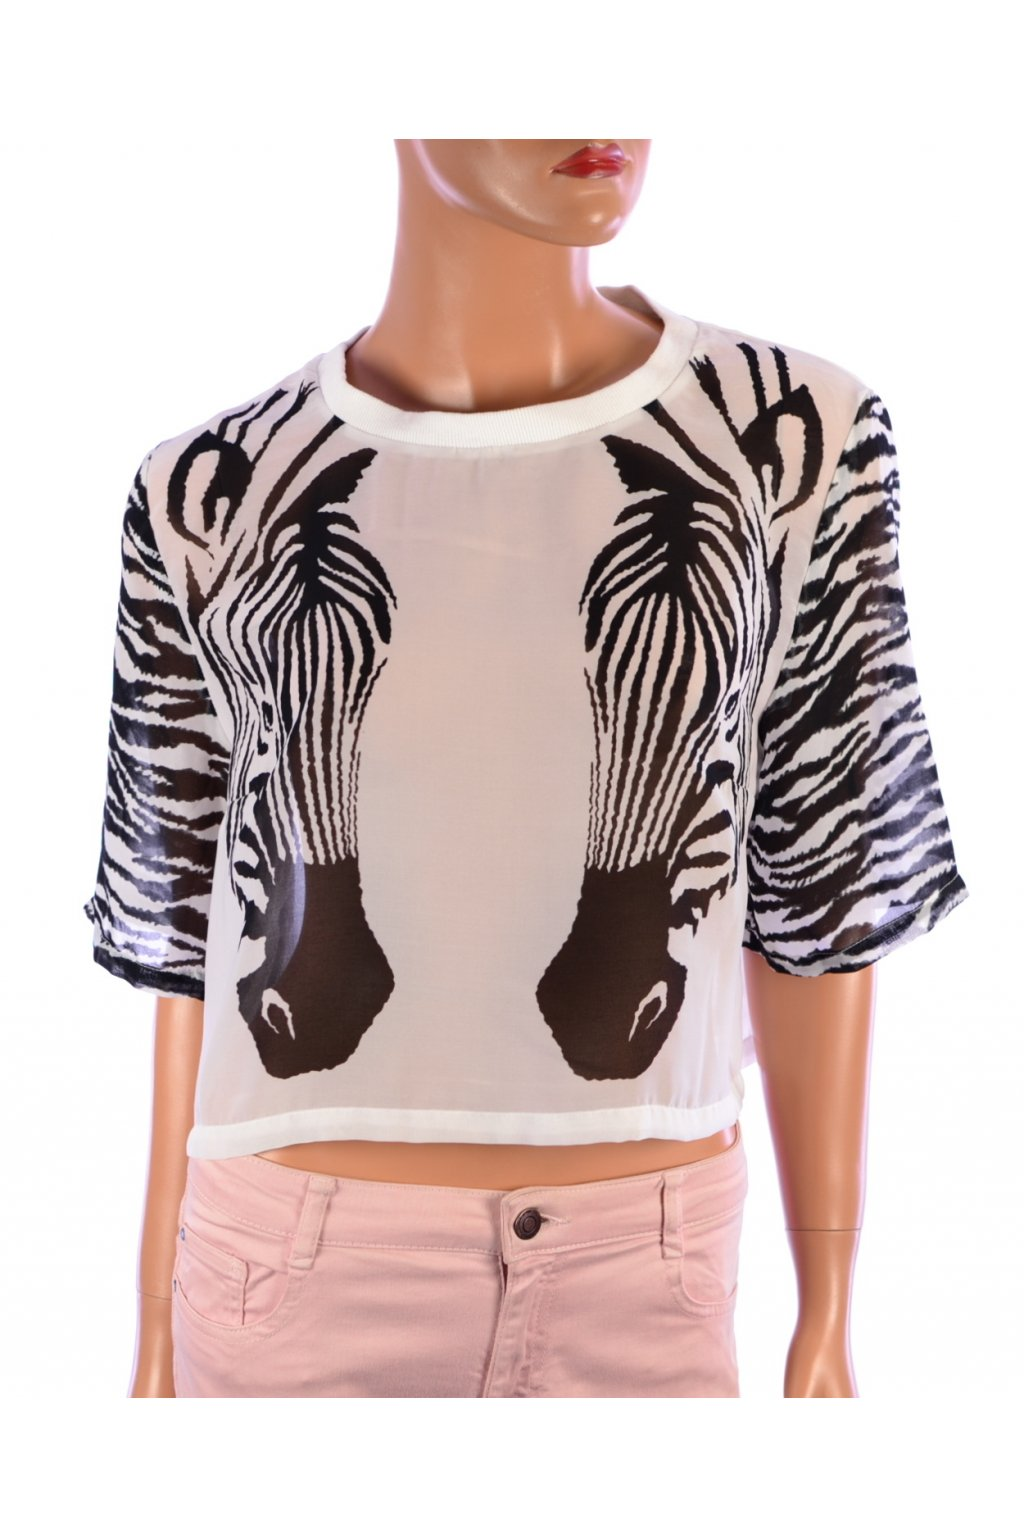 Halenka H&M zebra vel. 42 / M